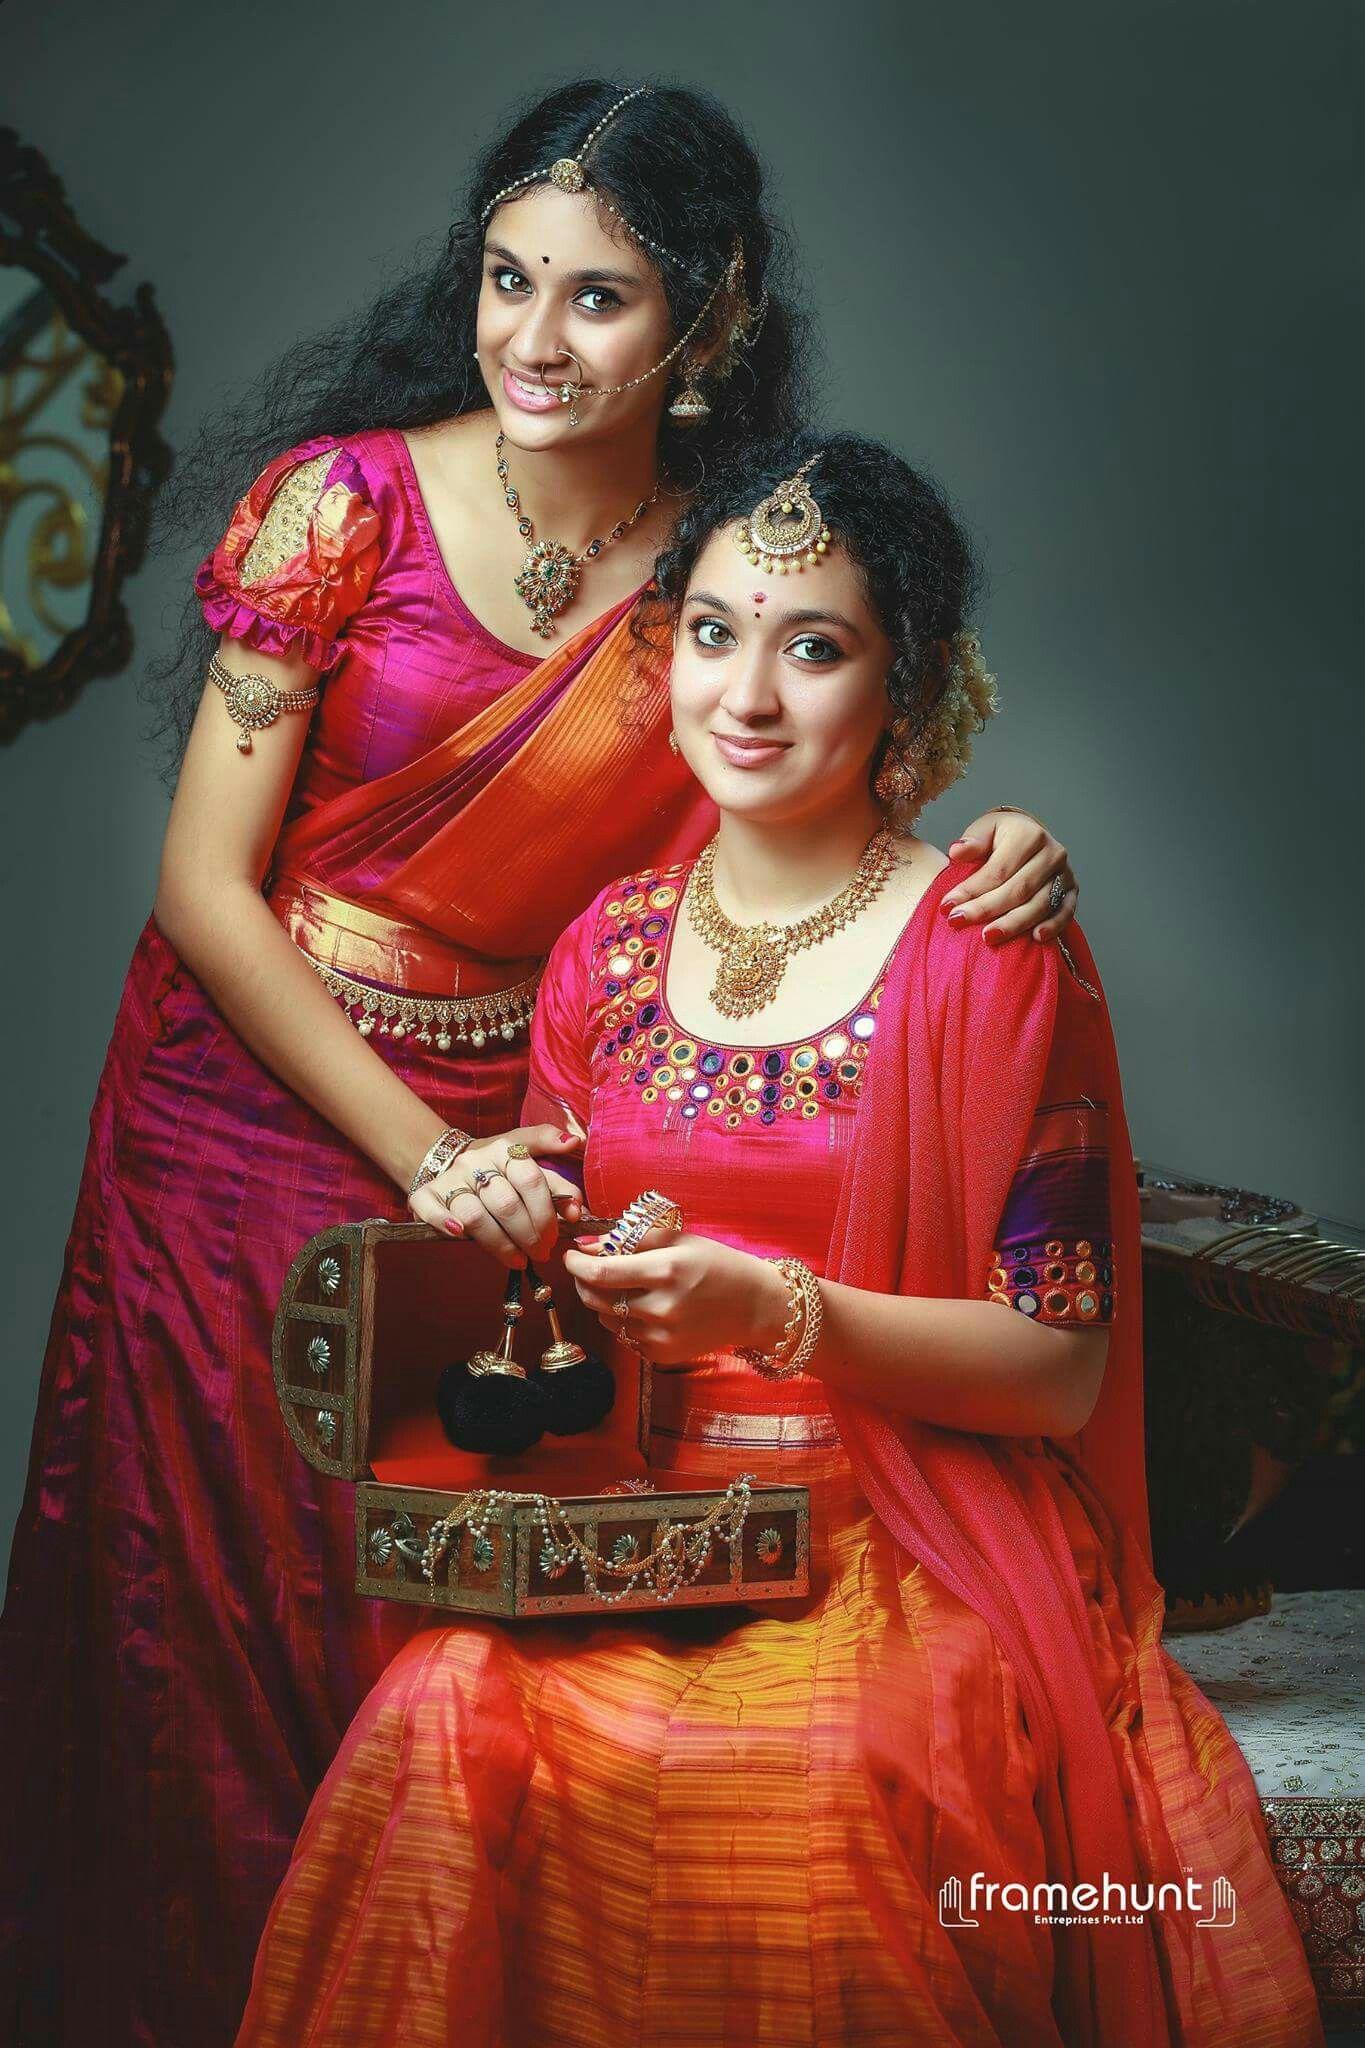 Pin by Alphonsa Thomas on Kerala bride | Pinterest | Indian girls ...